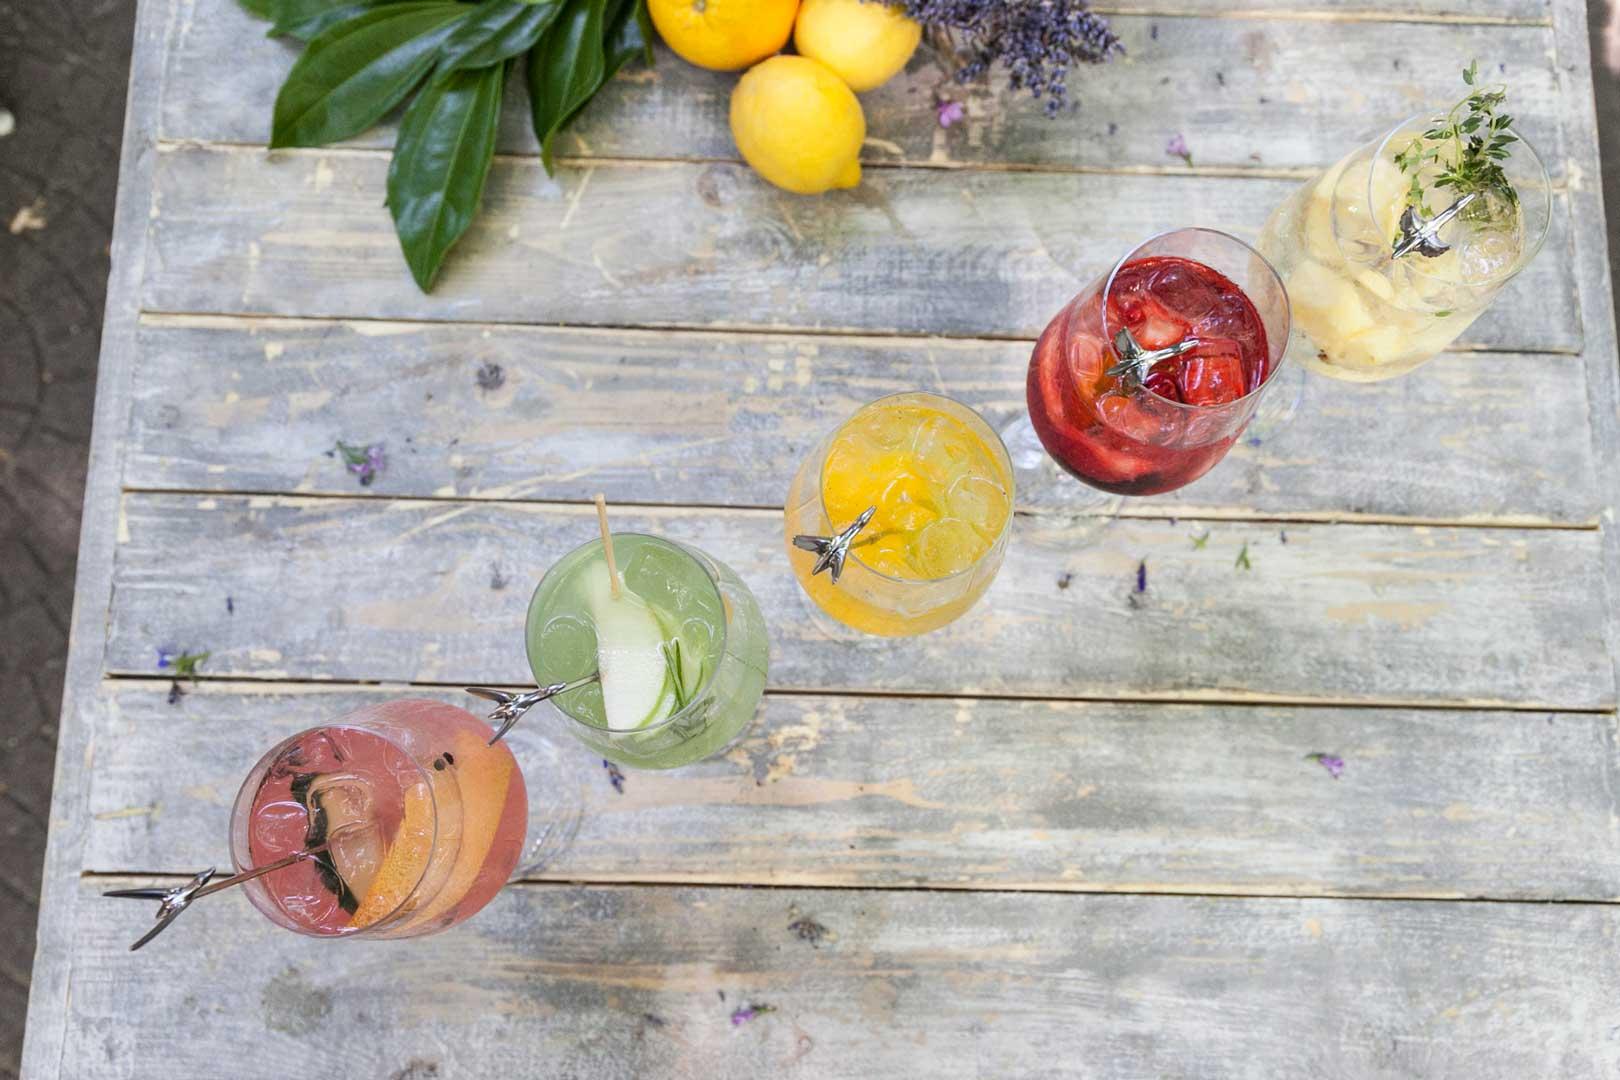 Grey Goose Atelier of Taste @ Sheraton Diana Majestic | Cocktails